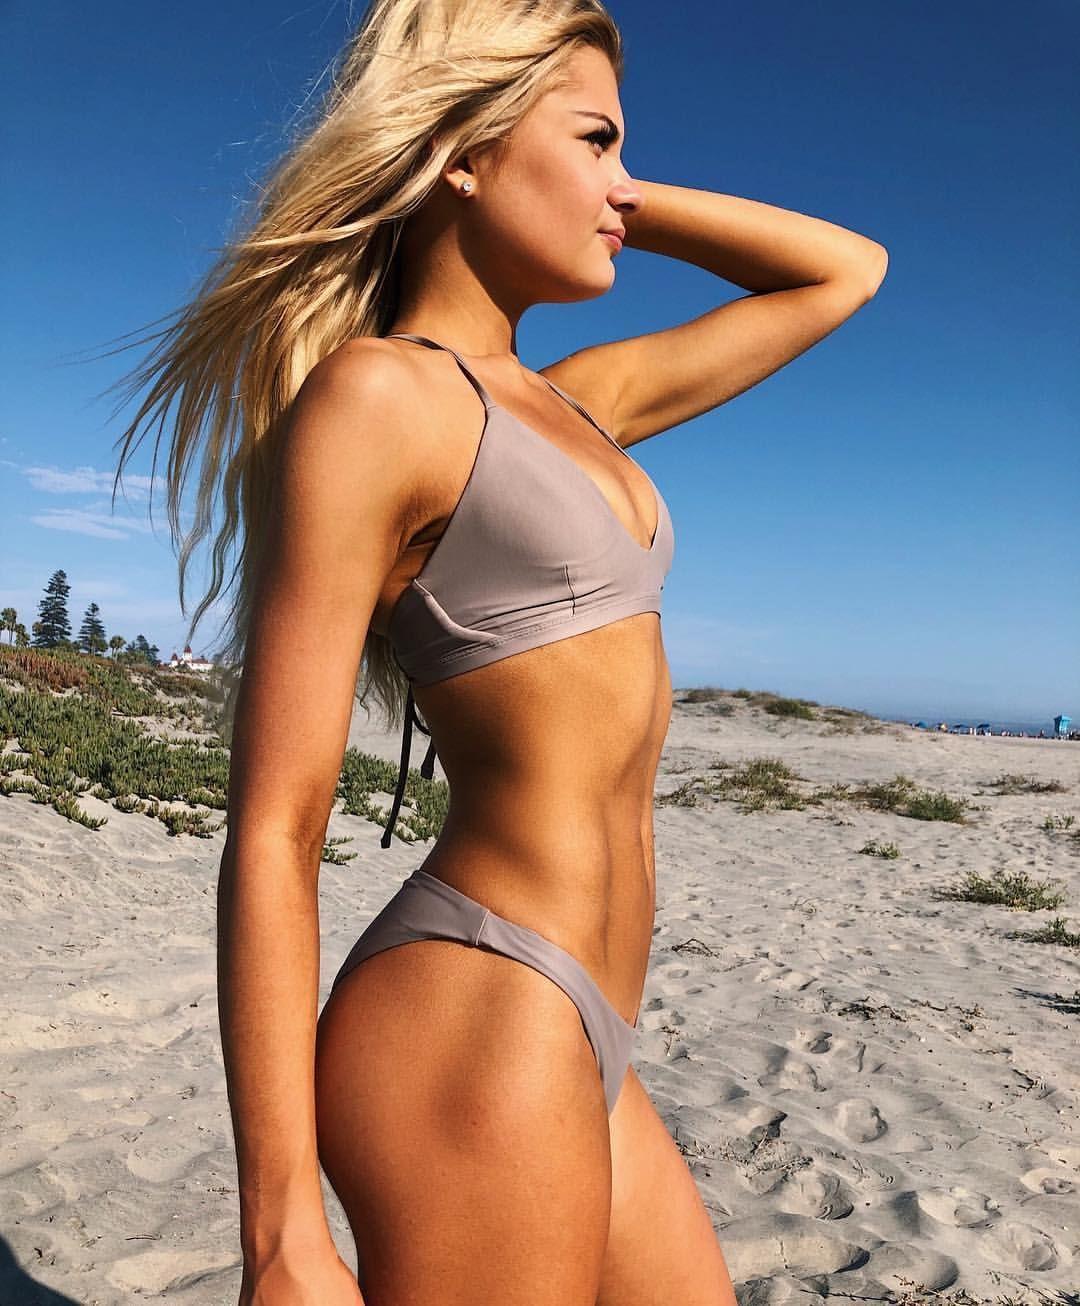 Danielle lloyd shows off tight bikini body in pool changing room selfie